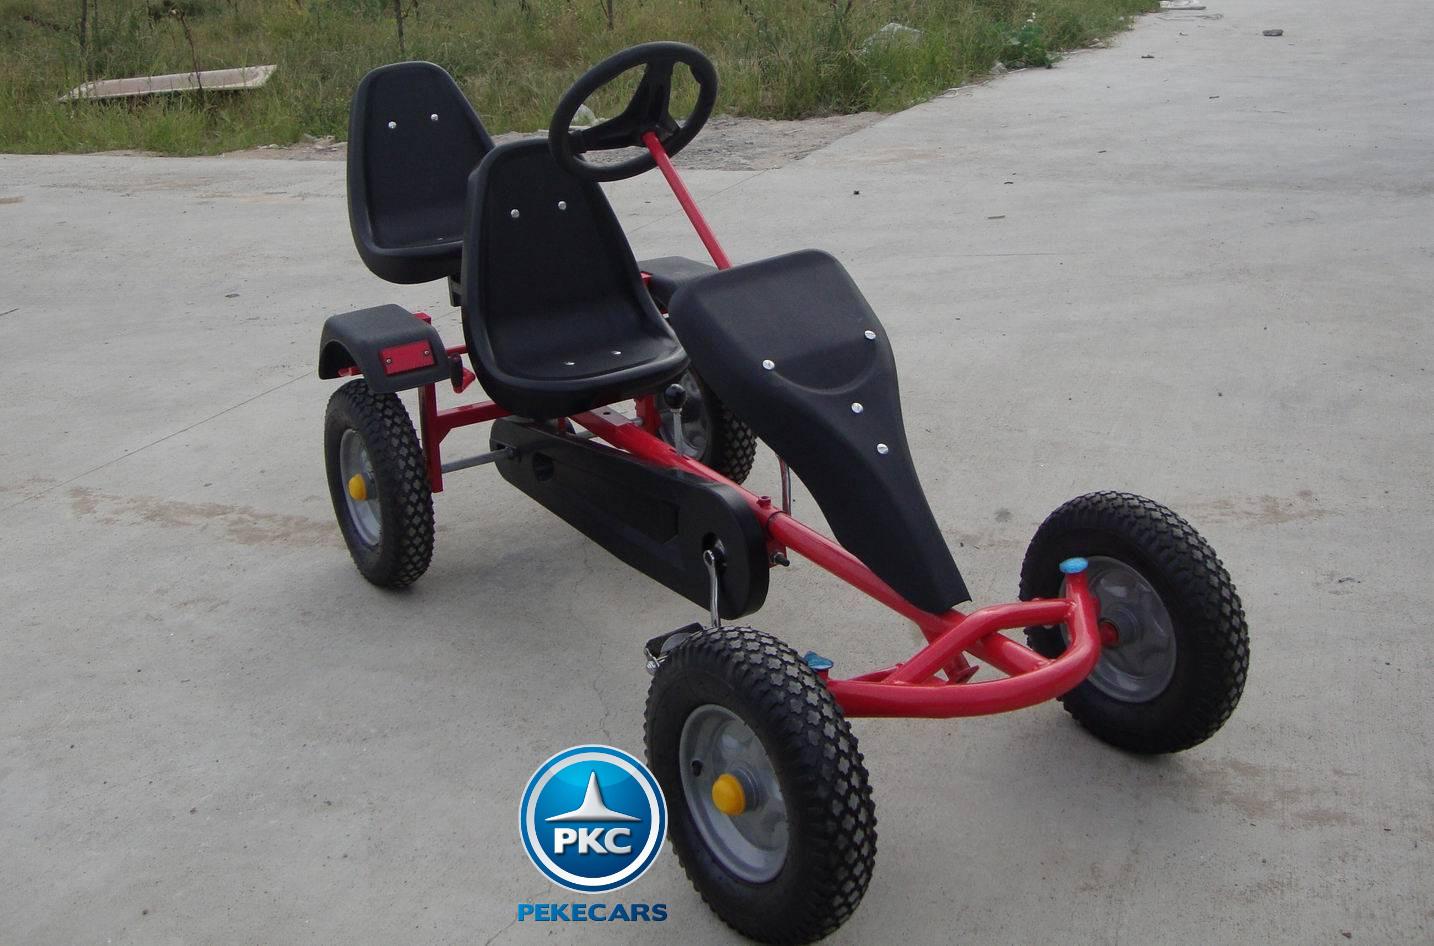 Kart de pedales sandbeach rojo vista principal